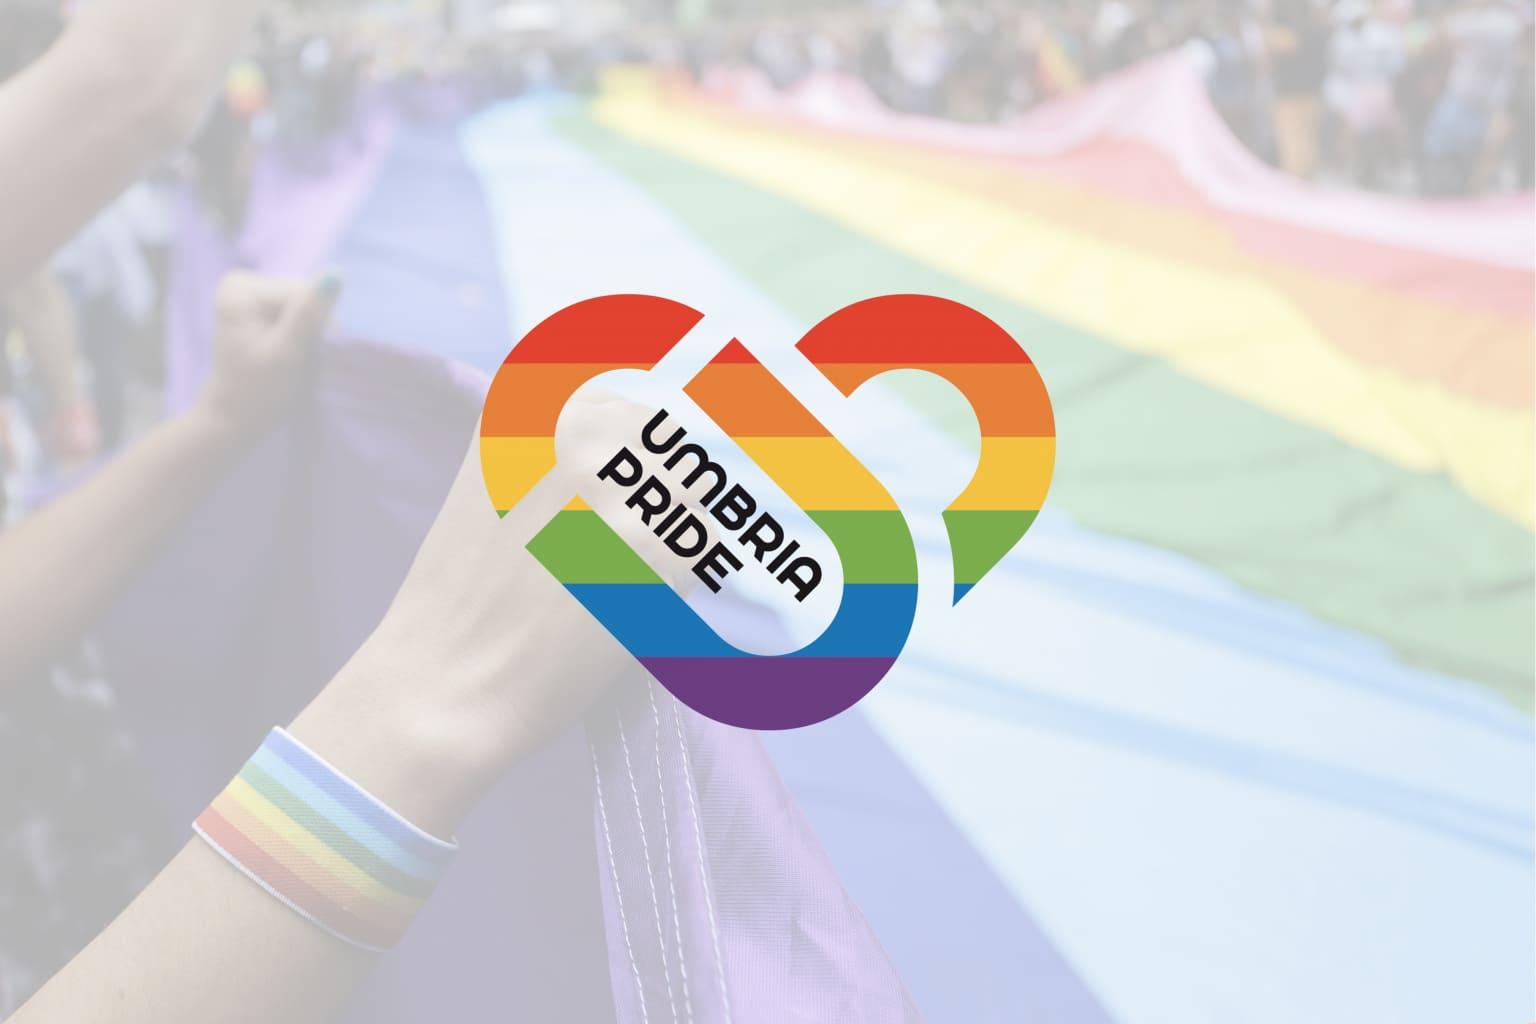 Umbria Pride cover - stilographico